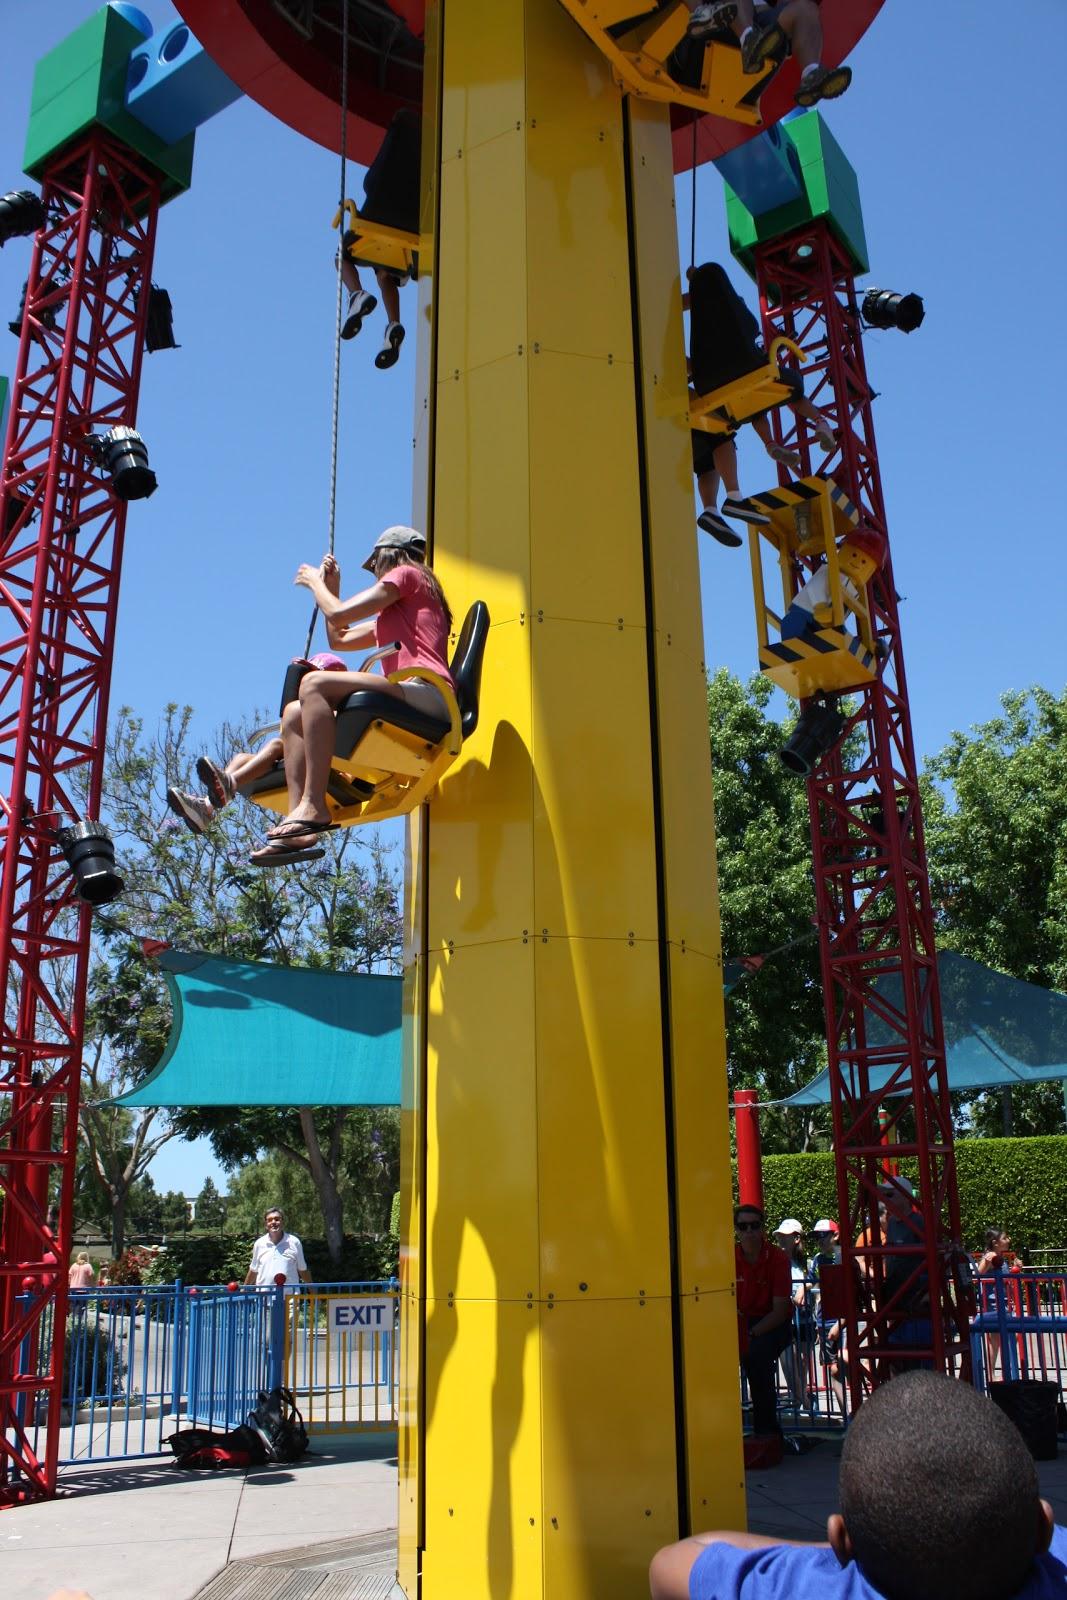 Ride Drive For Once Everyone On John >> The Kovash Family: Legoland California